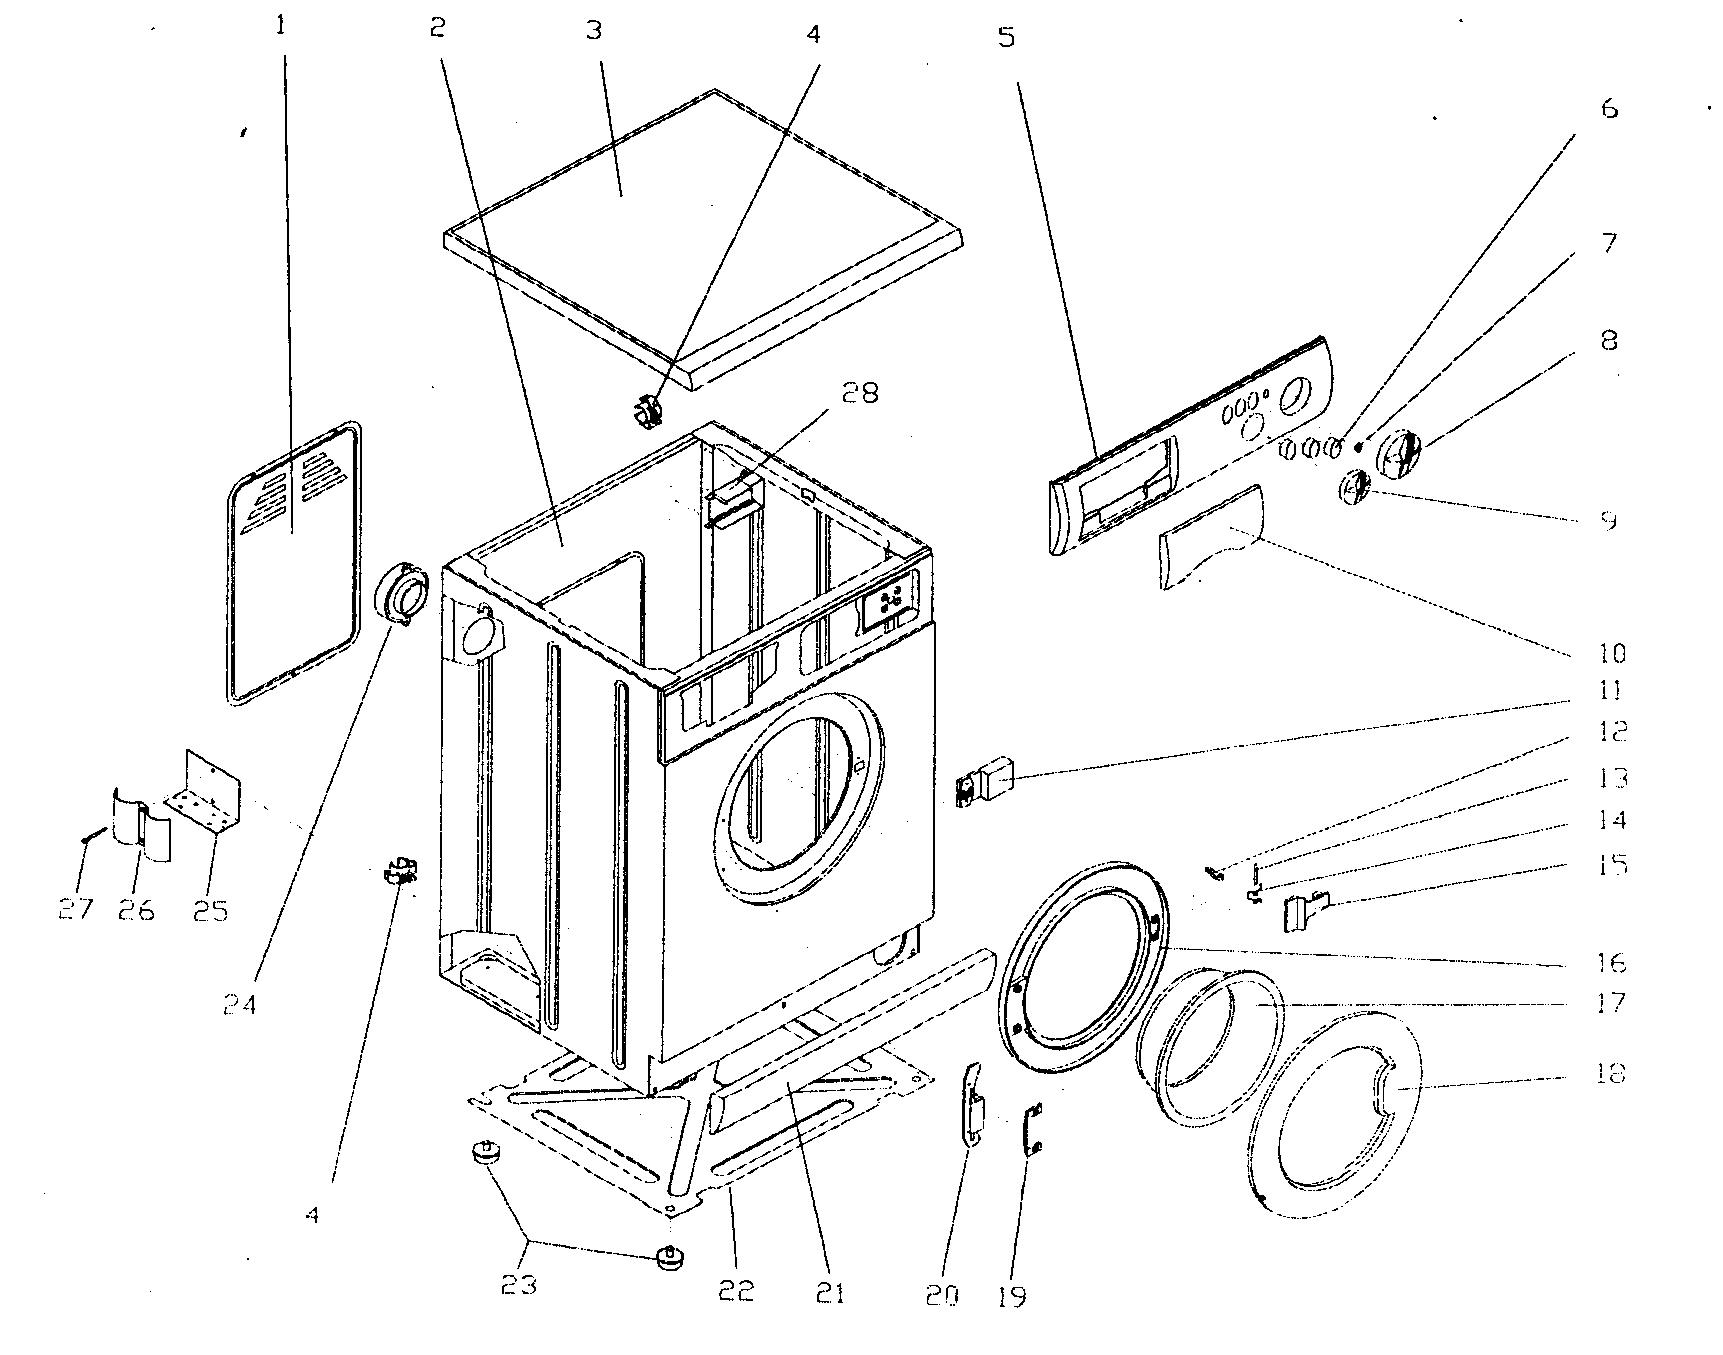 wiring diagram kenmore dryer heating element location